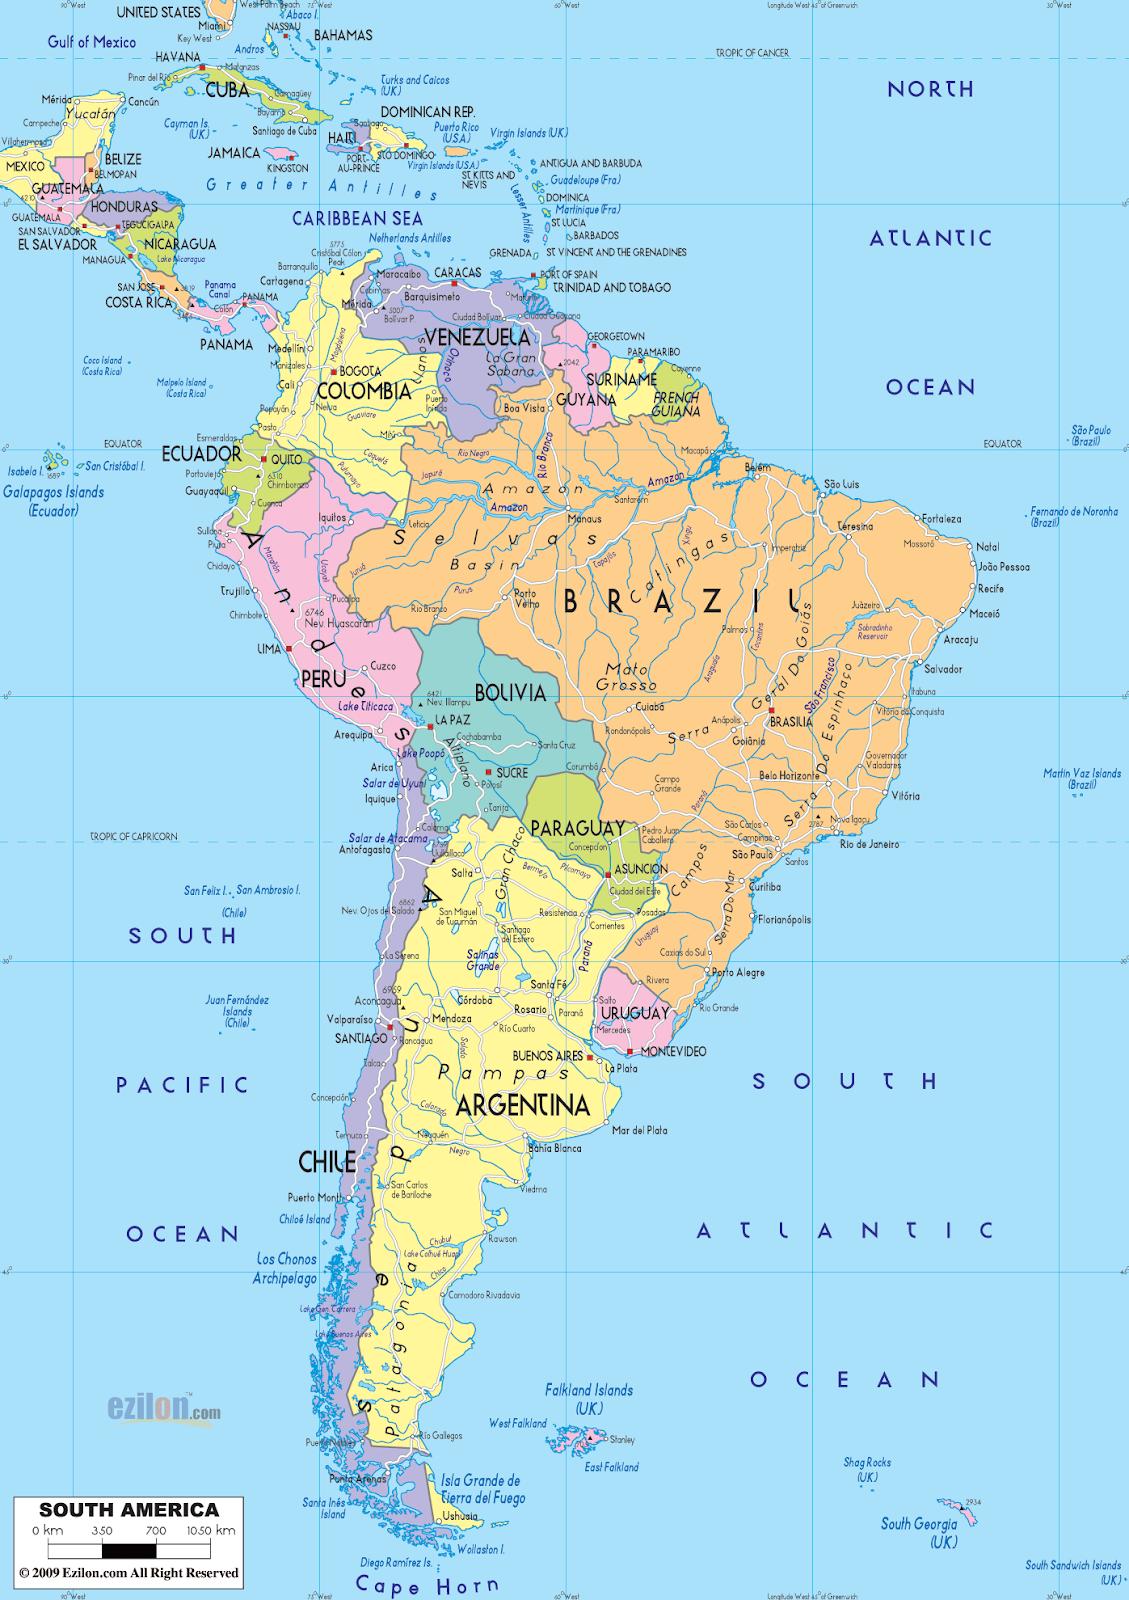 दक्षिण अमेरिका महाद्वीप